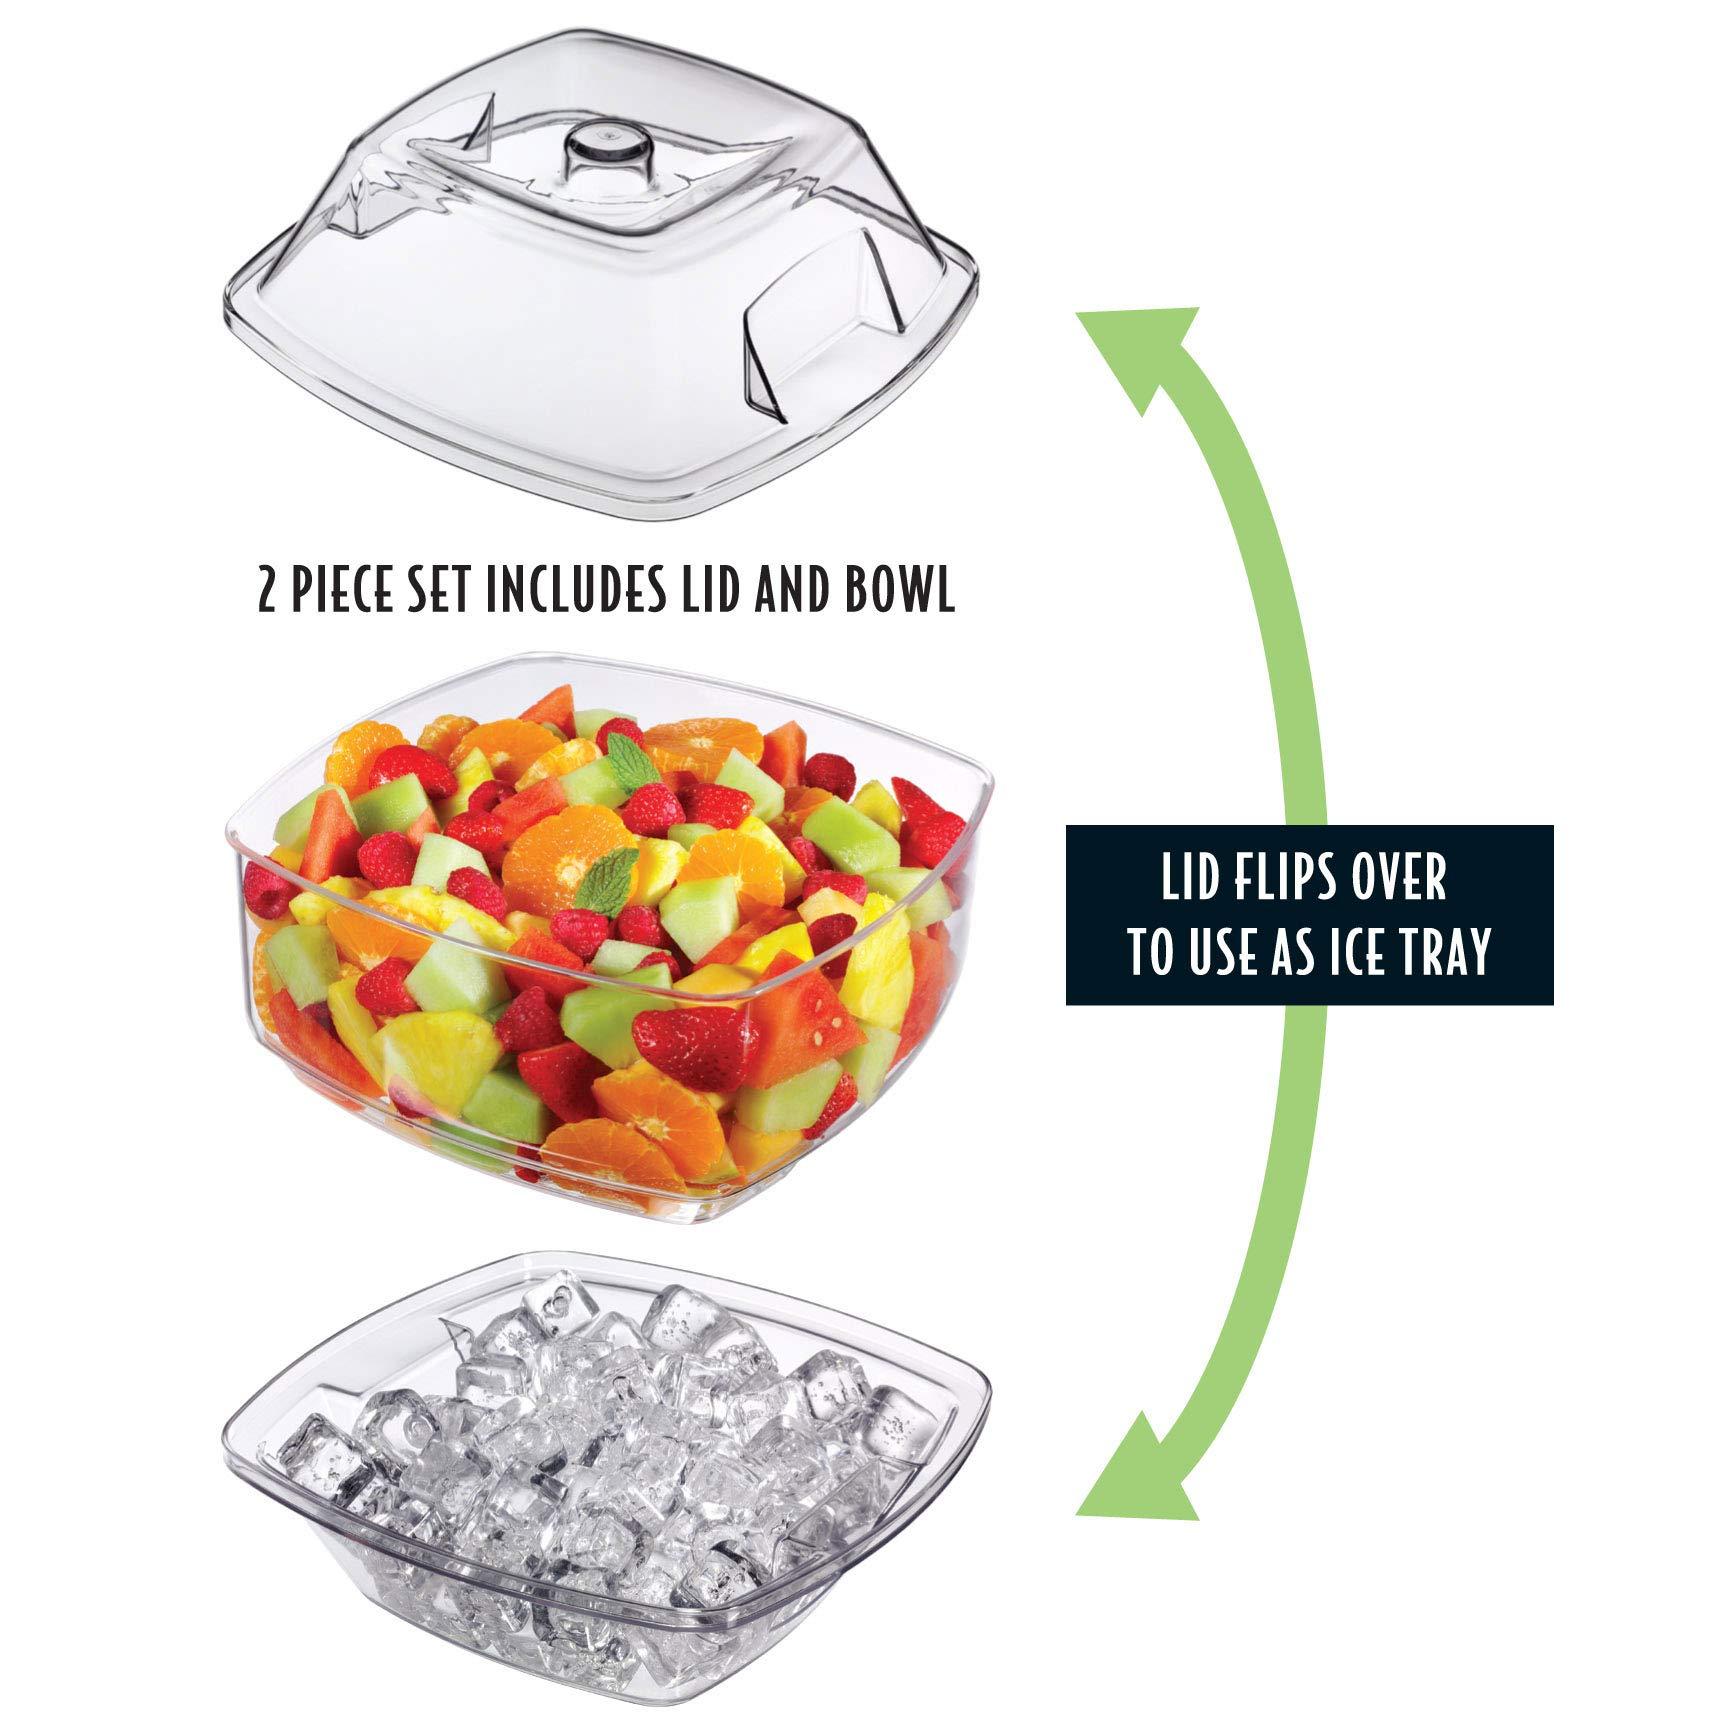 Prodyne SB-10 Flip Salad On Ice Bowl with Lid Set, 10'', Clear by Prodyne